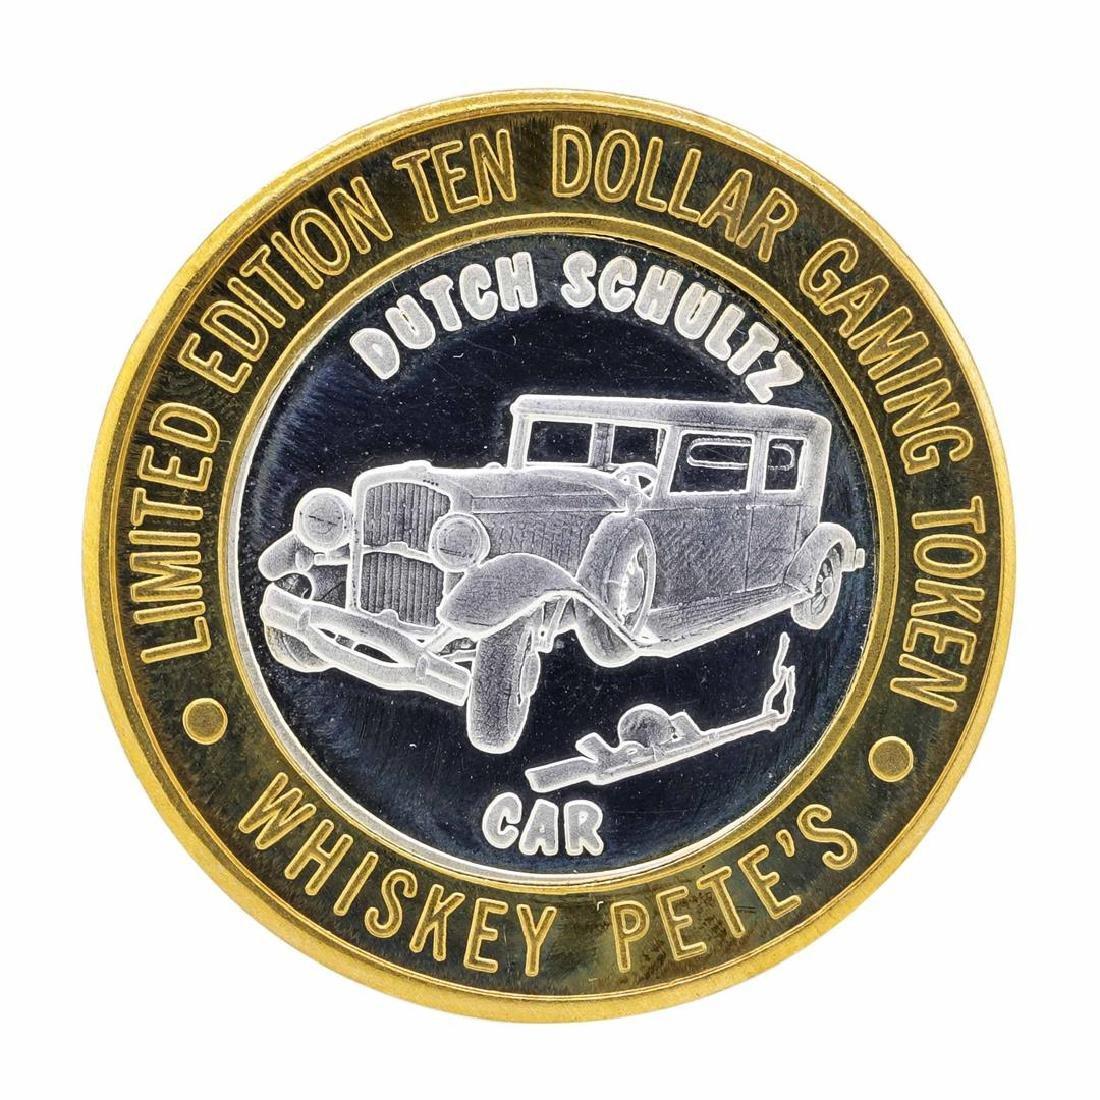 .999 Silver Whiskey Pete's Casino Jean, Nevada $10